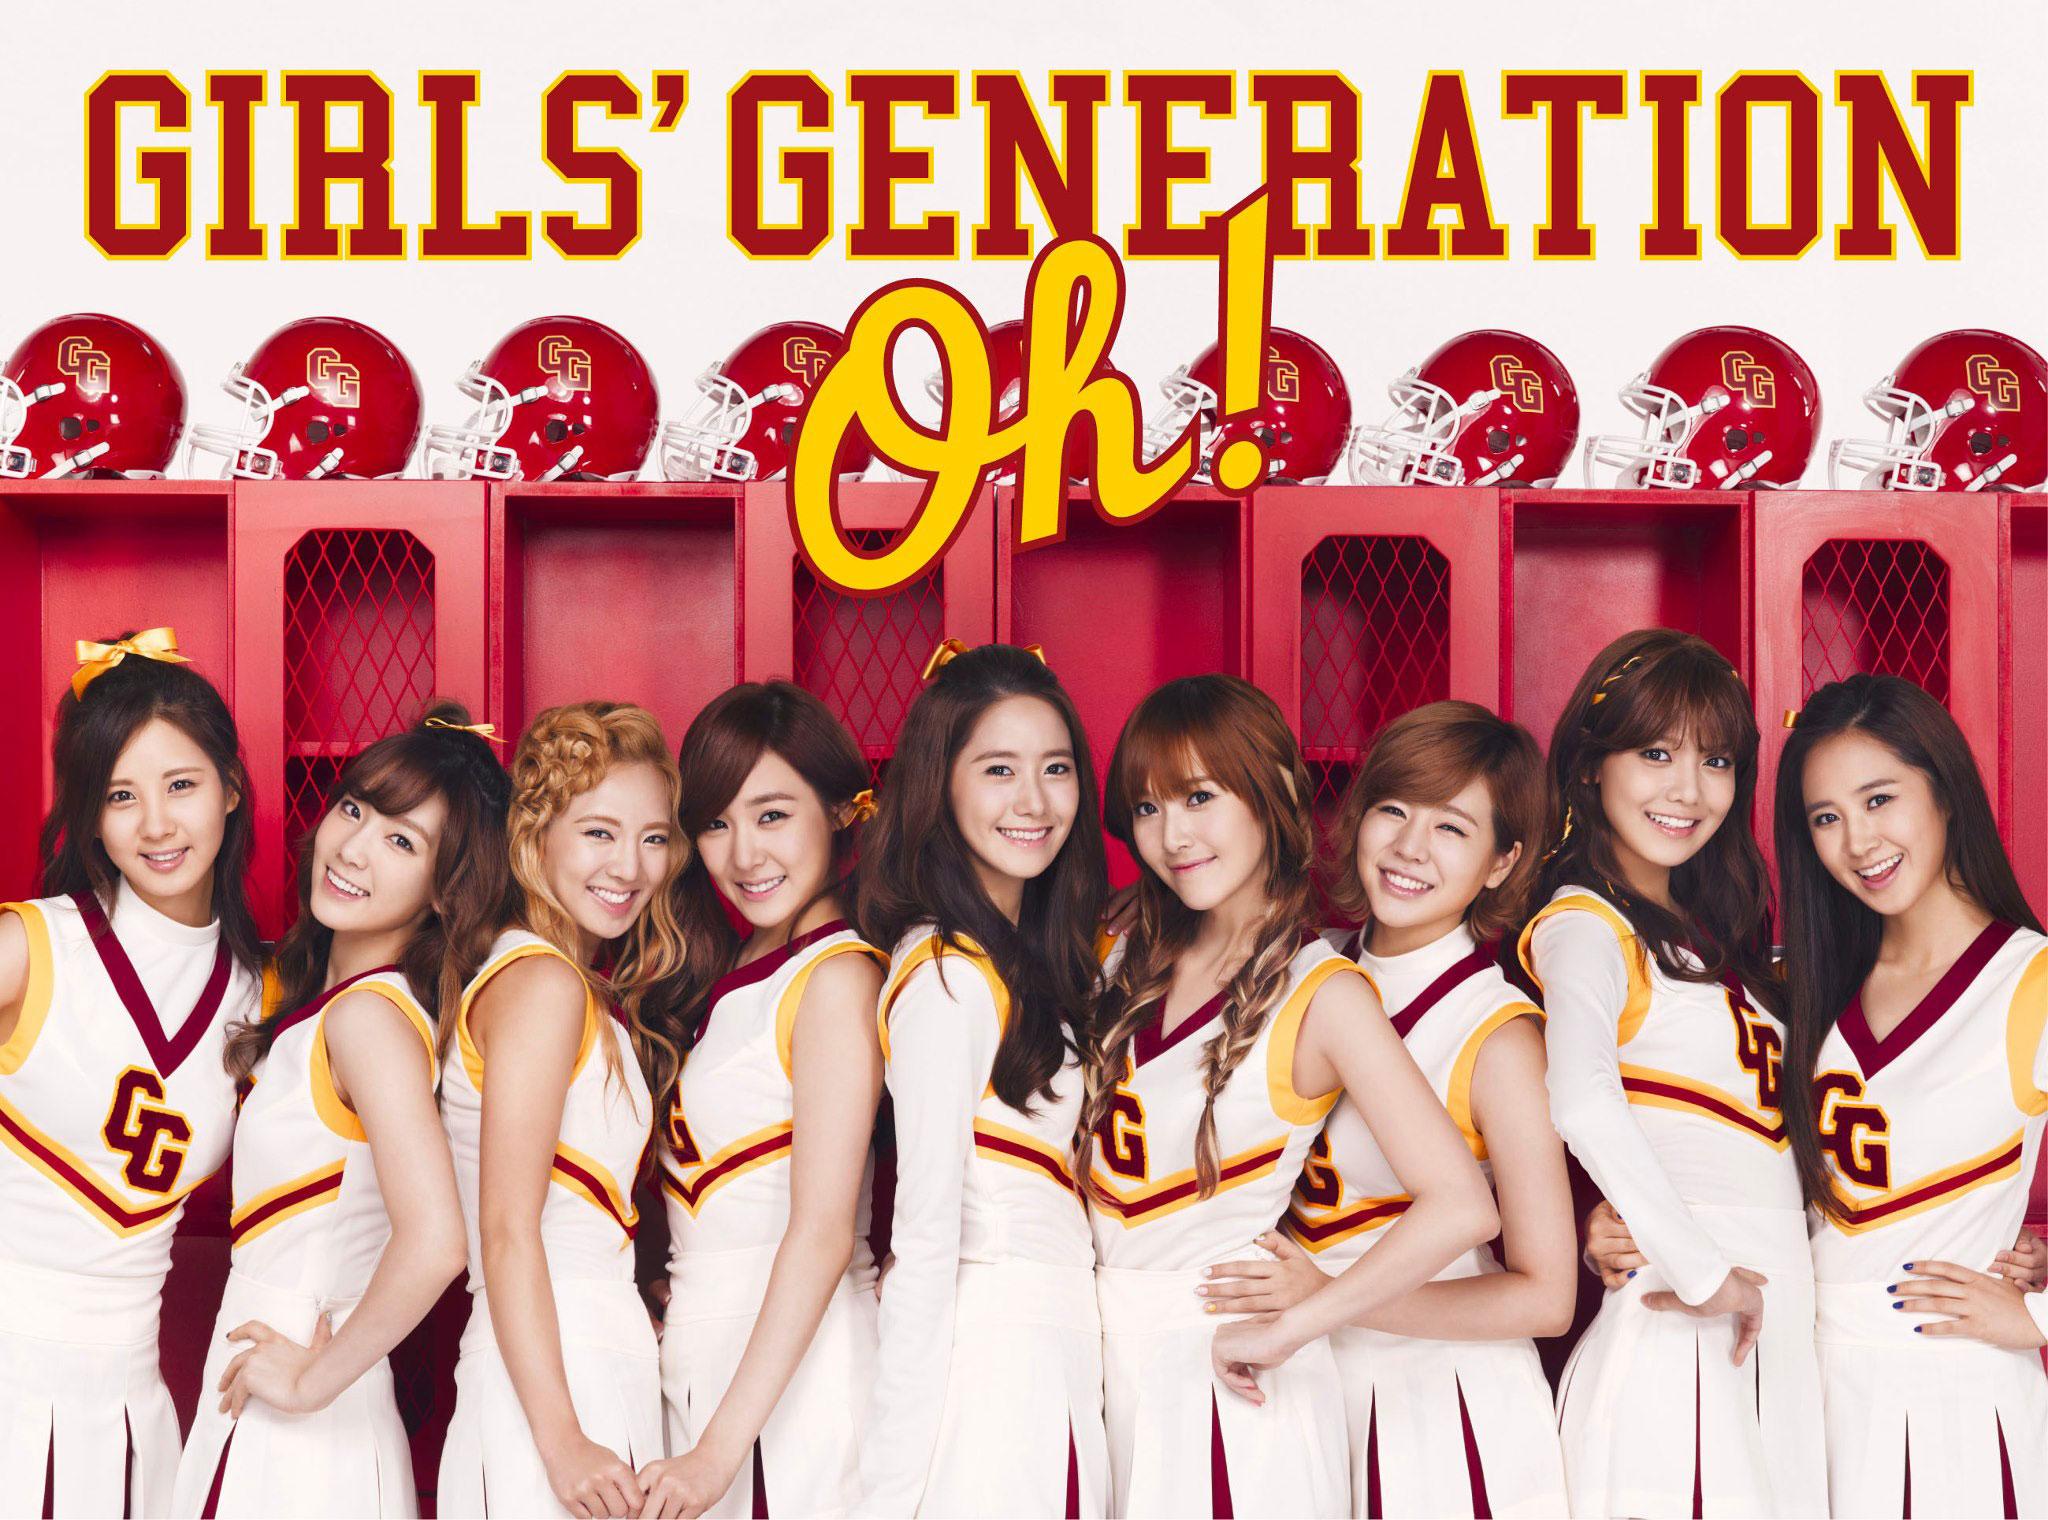 Oh! (сингл Girls' Generation)